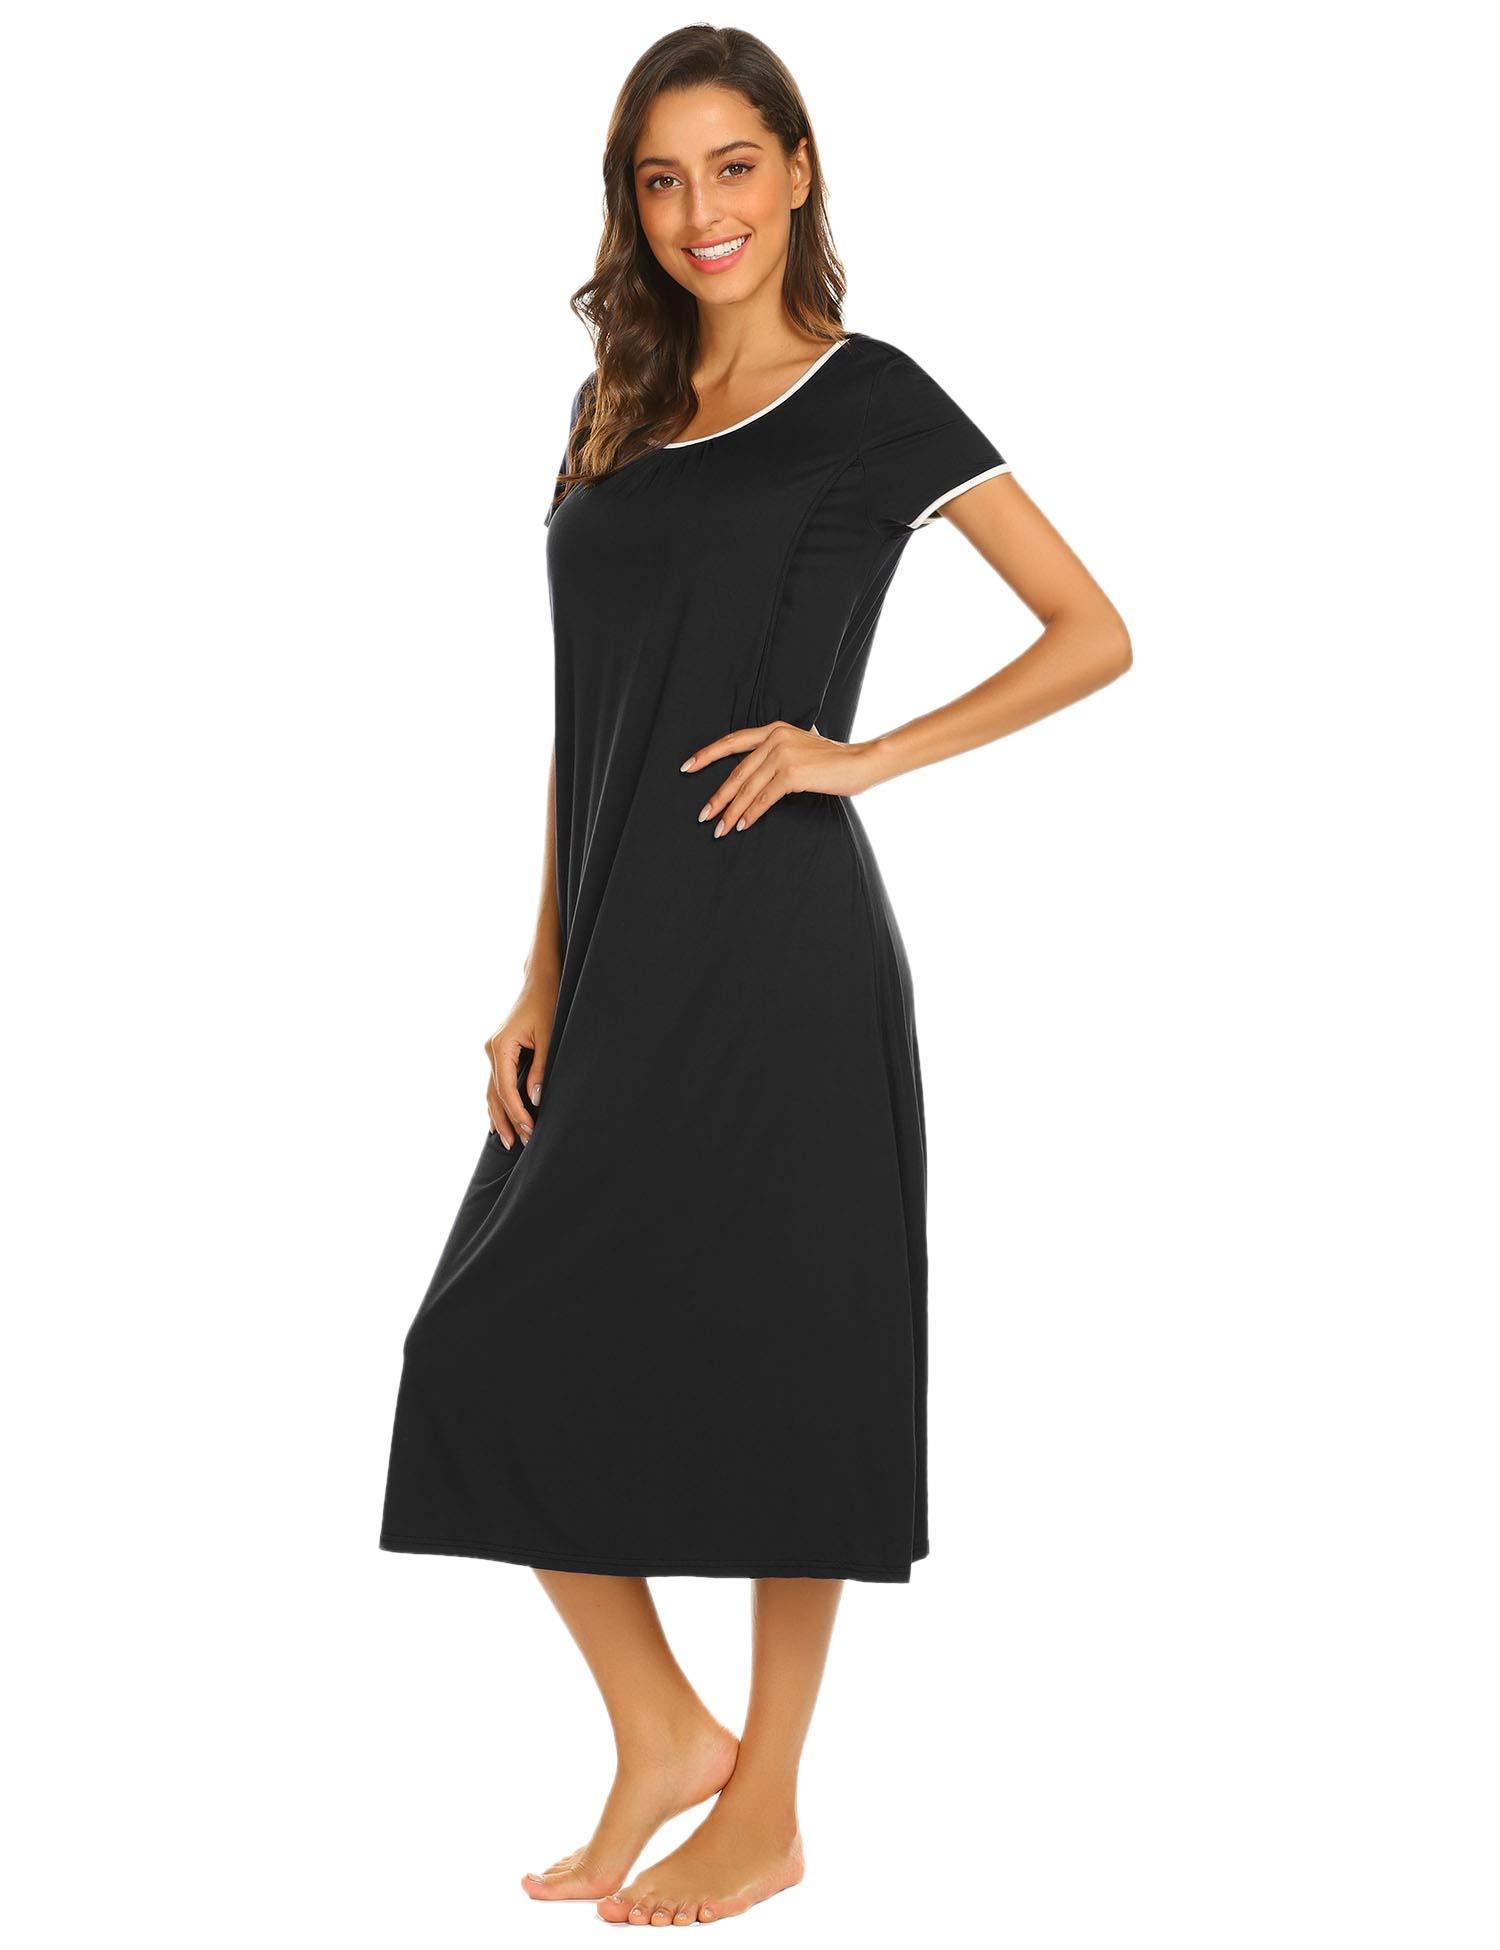 Ekouaer Sleepwear Women's Nightshirt Casual Loungewear Short Sleeve Long Nightgown, Black, Medium by Ekouaer